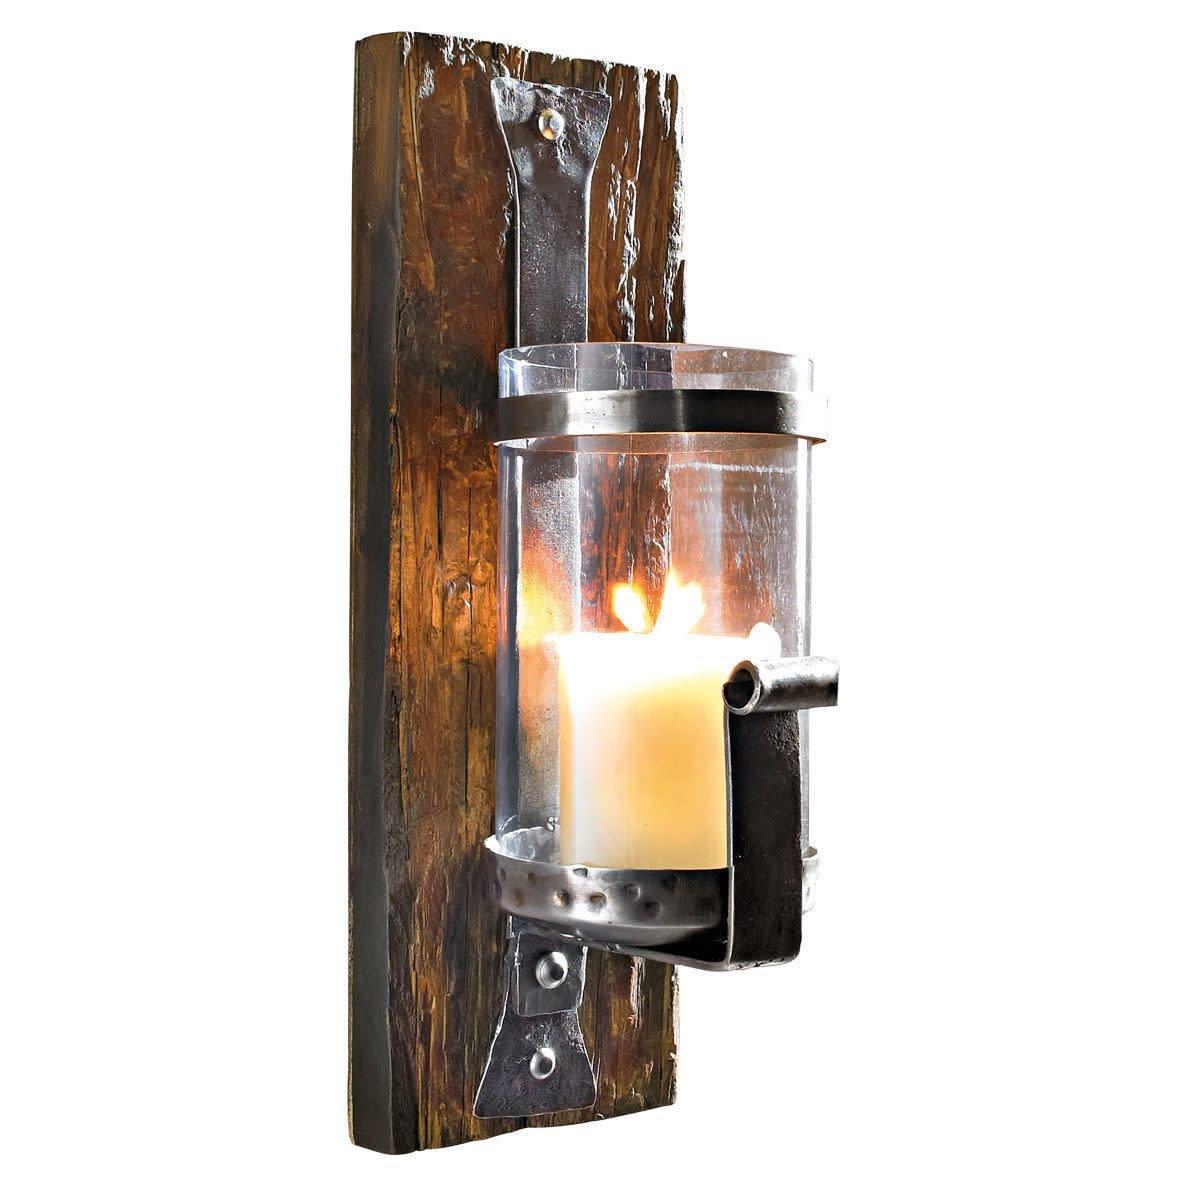 Portacandele da parete Wood PureDay